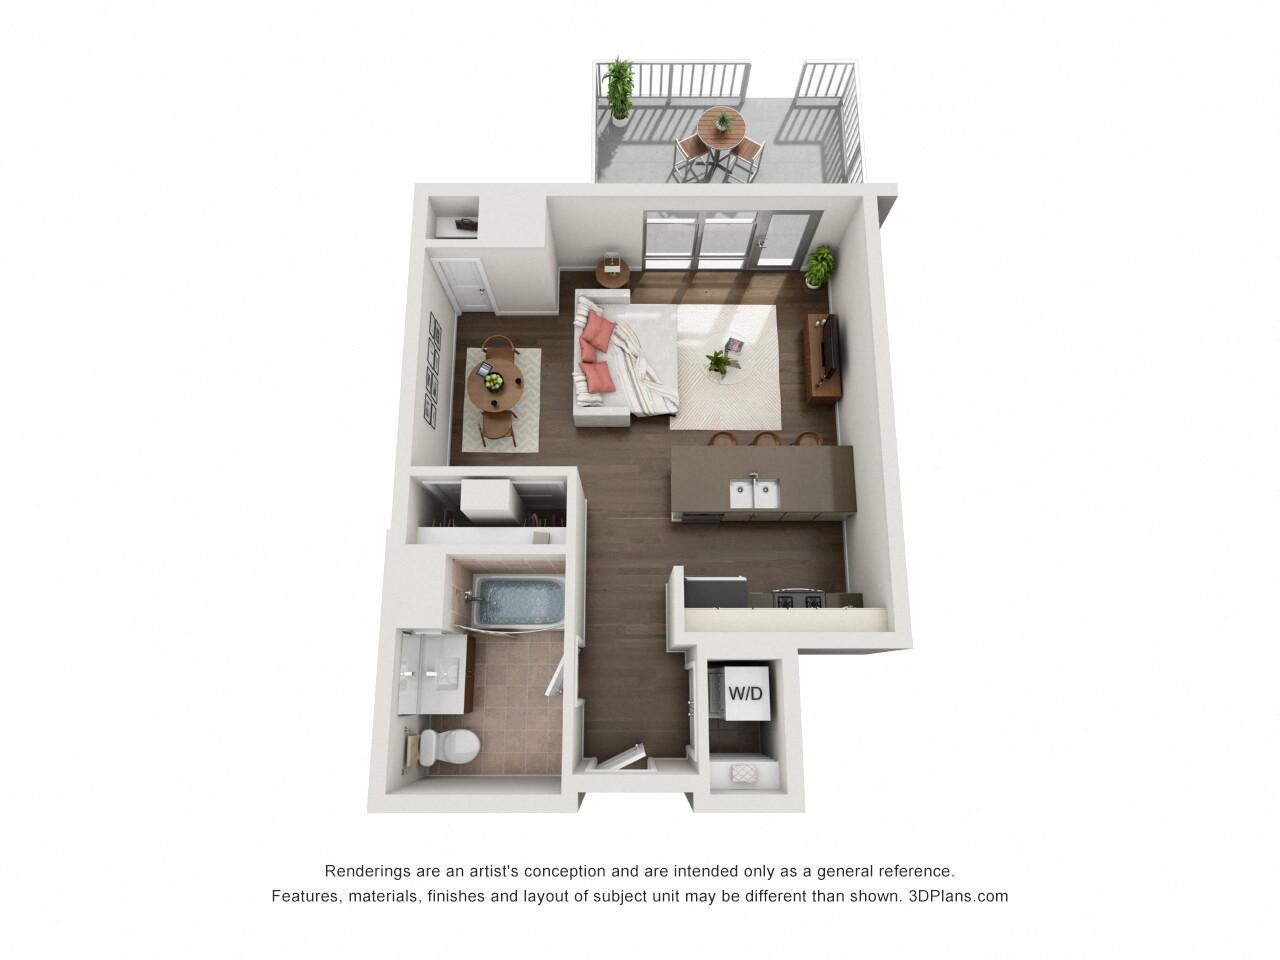 Studio, 1 & 2 Bedroom Apartments in Chicago, IL | The